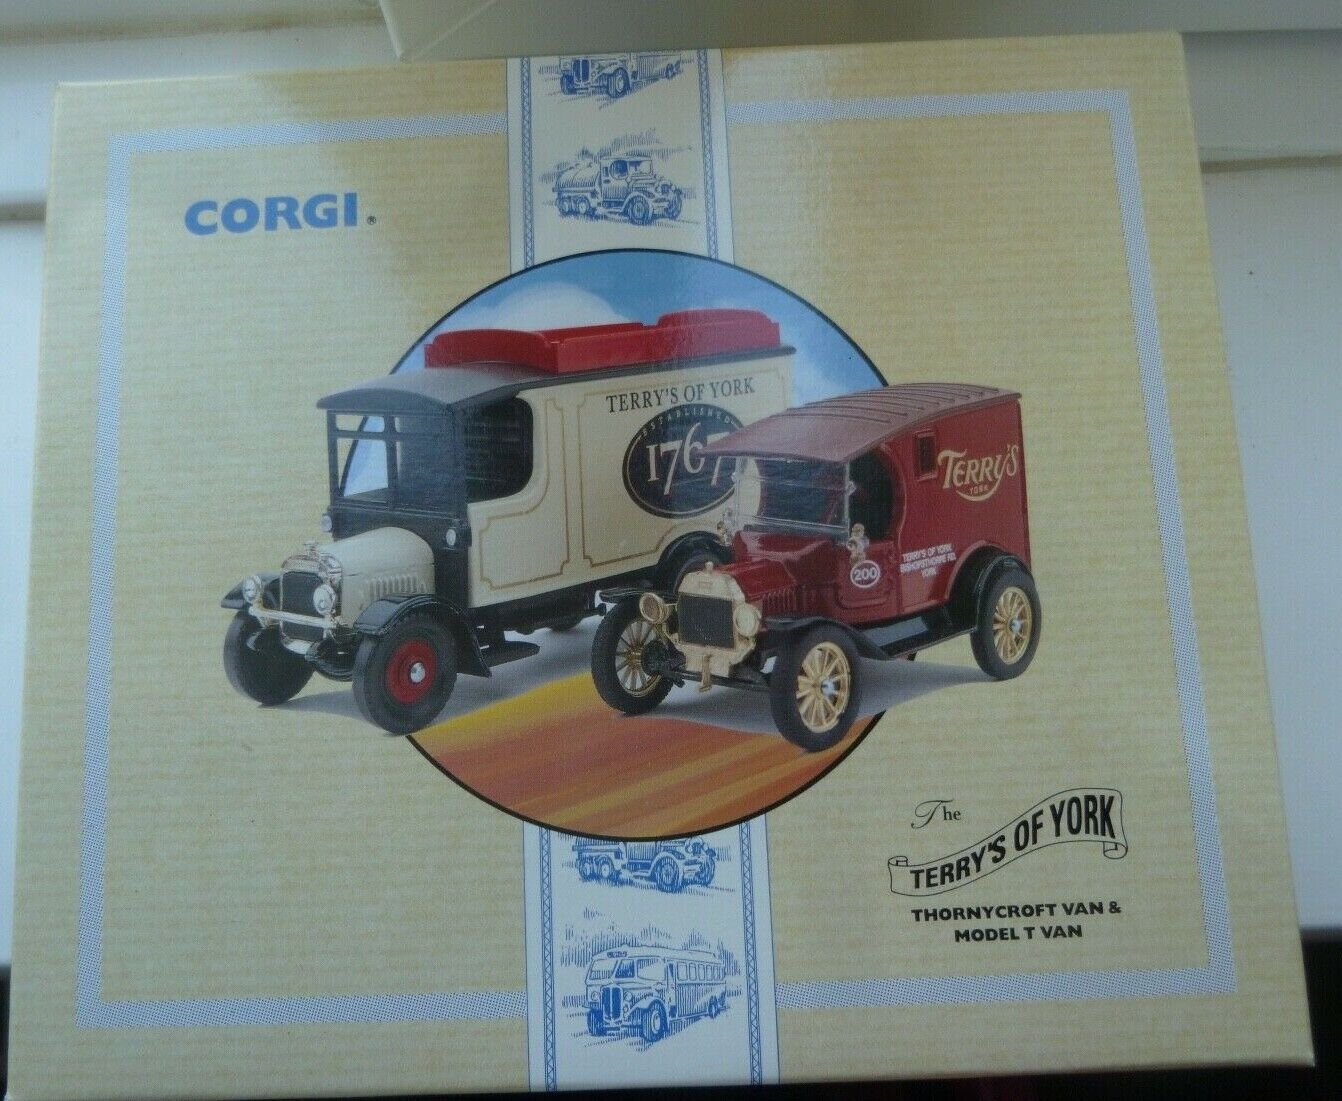 Corgi Vintage 1992 Terry's of York Thornycroft Van & Model T Van No 2279 - New